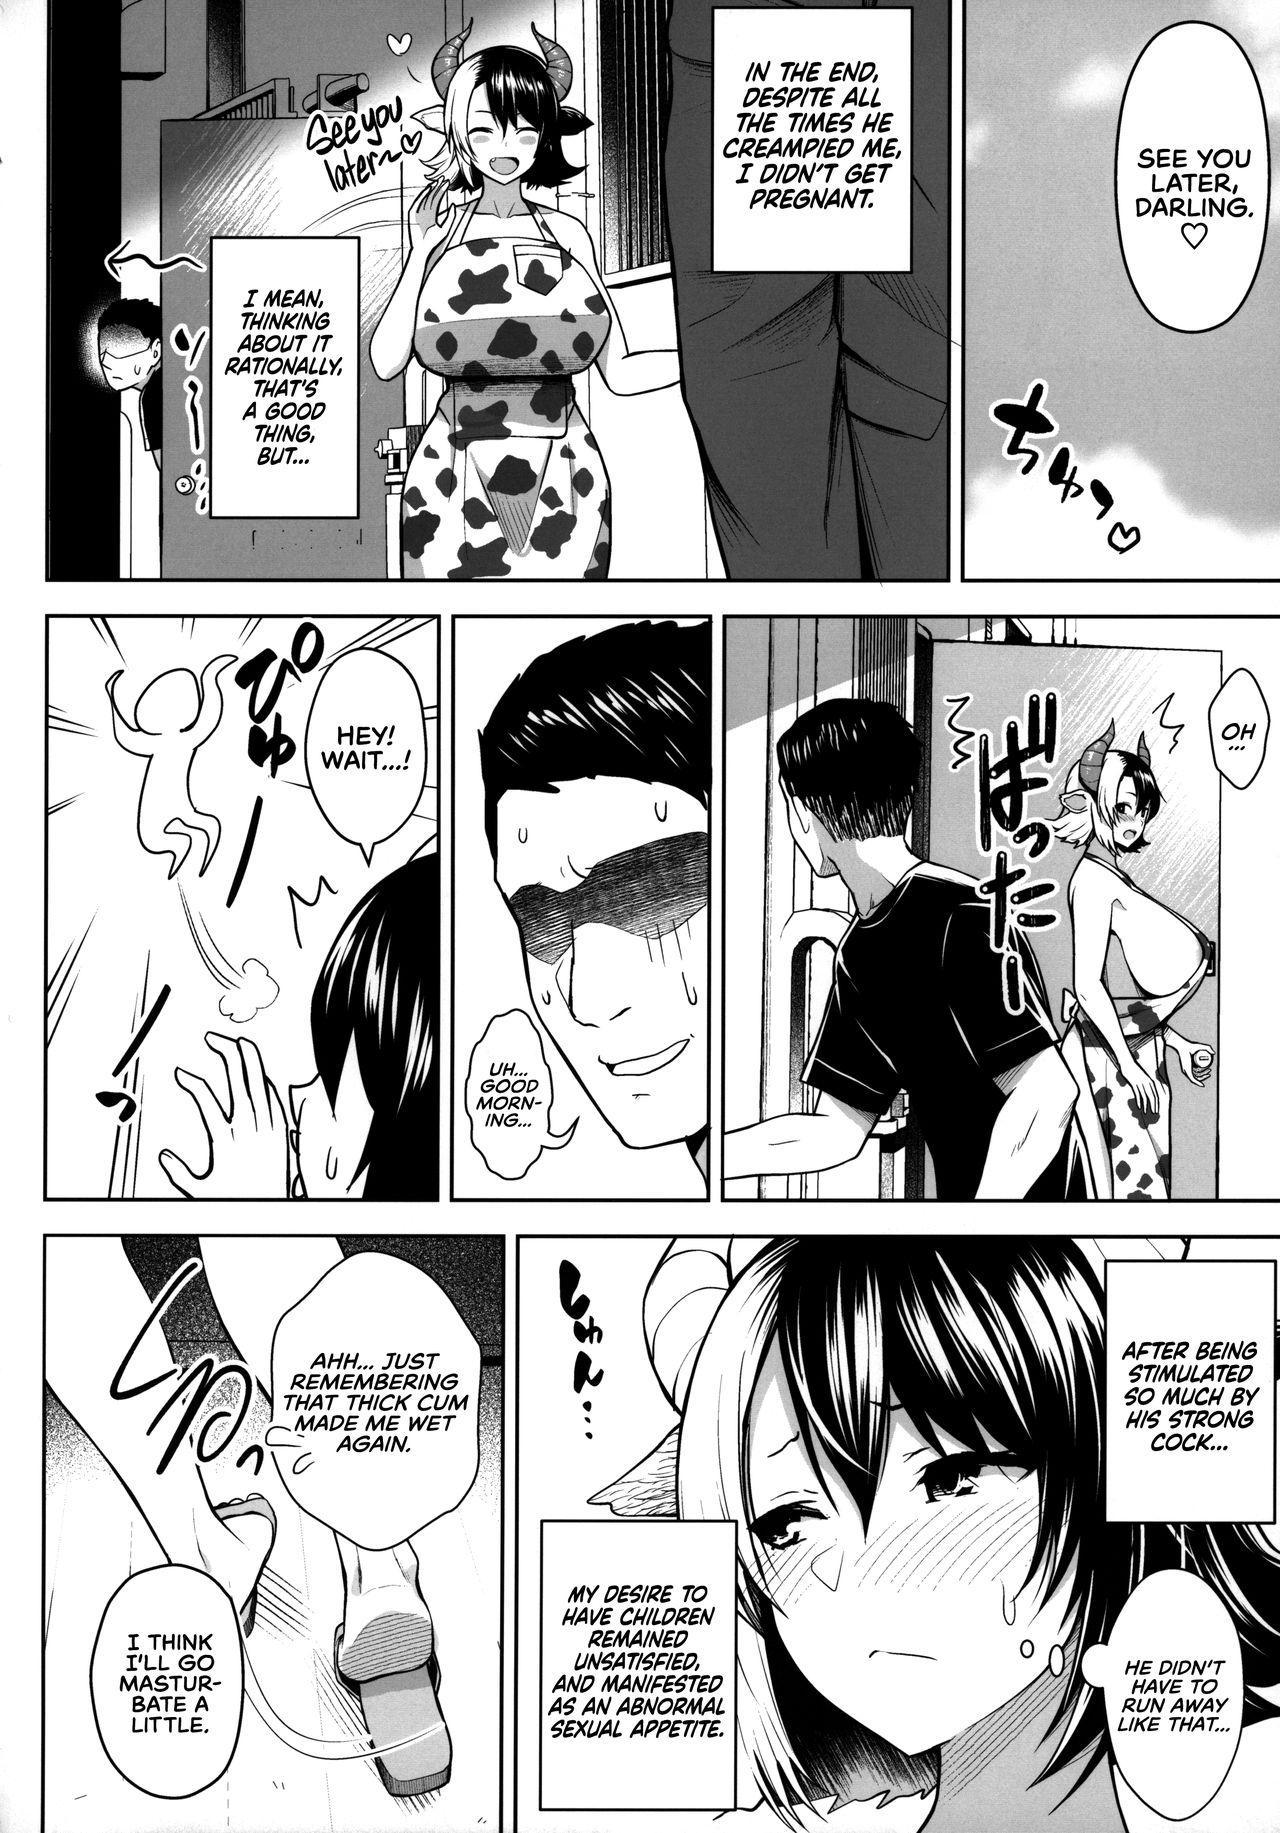 Oku-san no Oppai ga Dekasugiru noga Warui! 2 | It's Your Fault for Having Such Big Boobs, Miss! 2 31